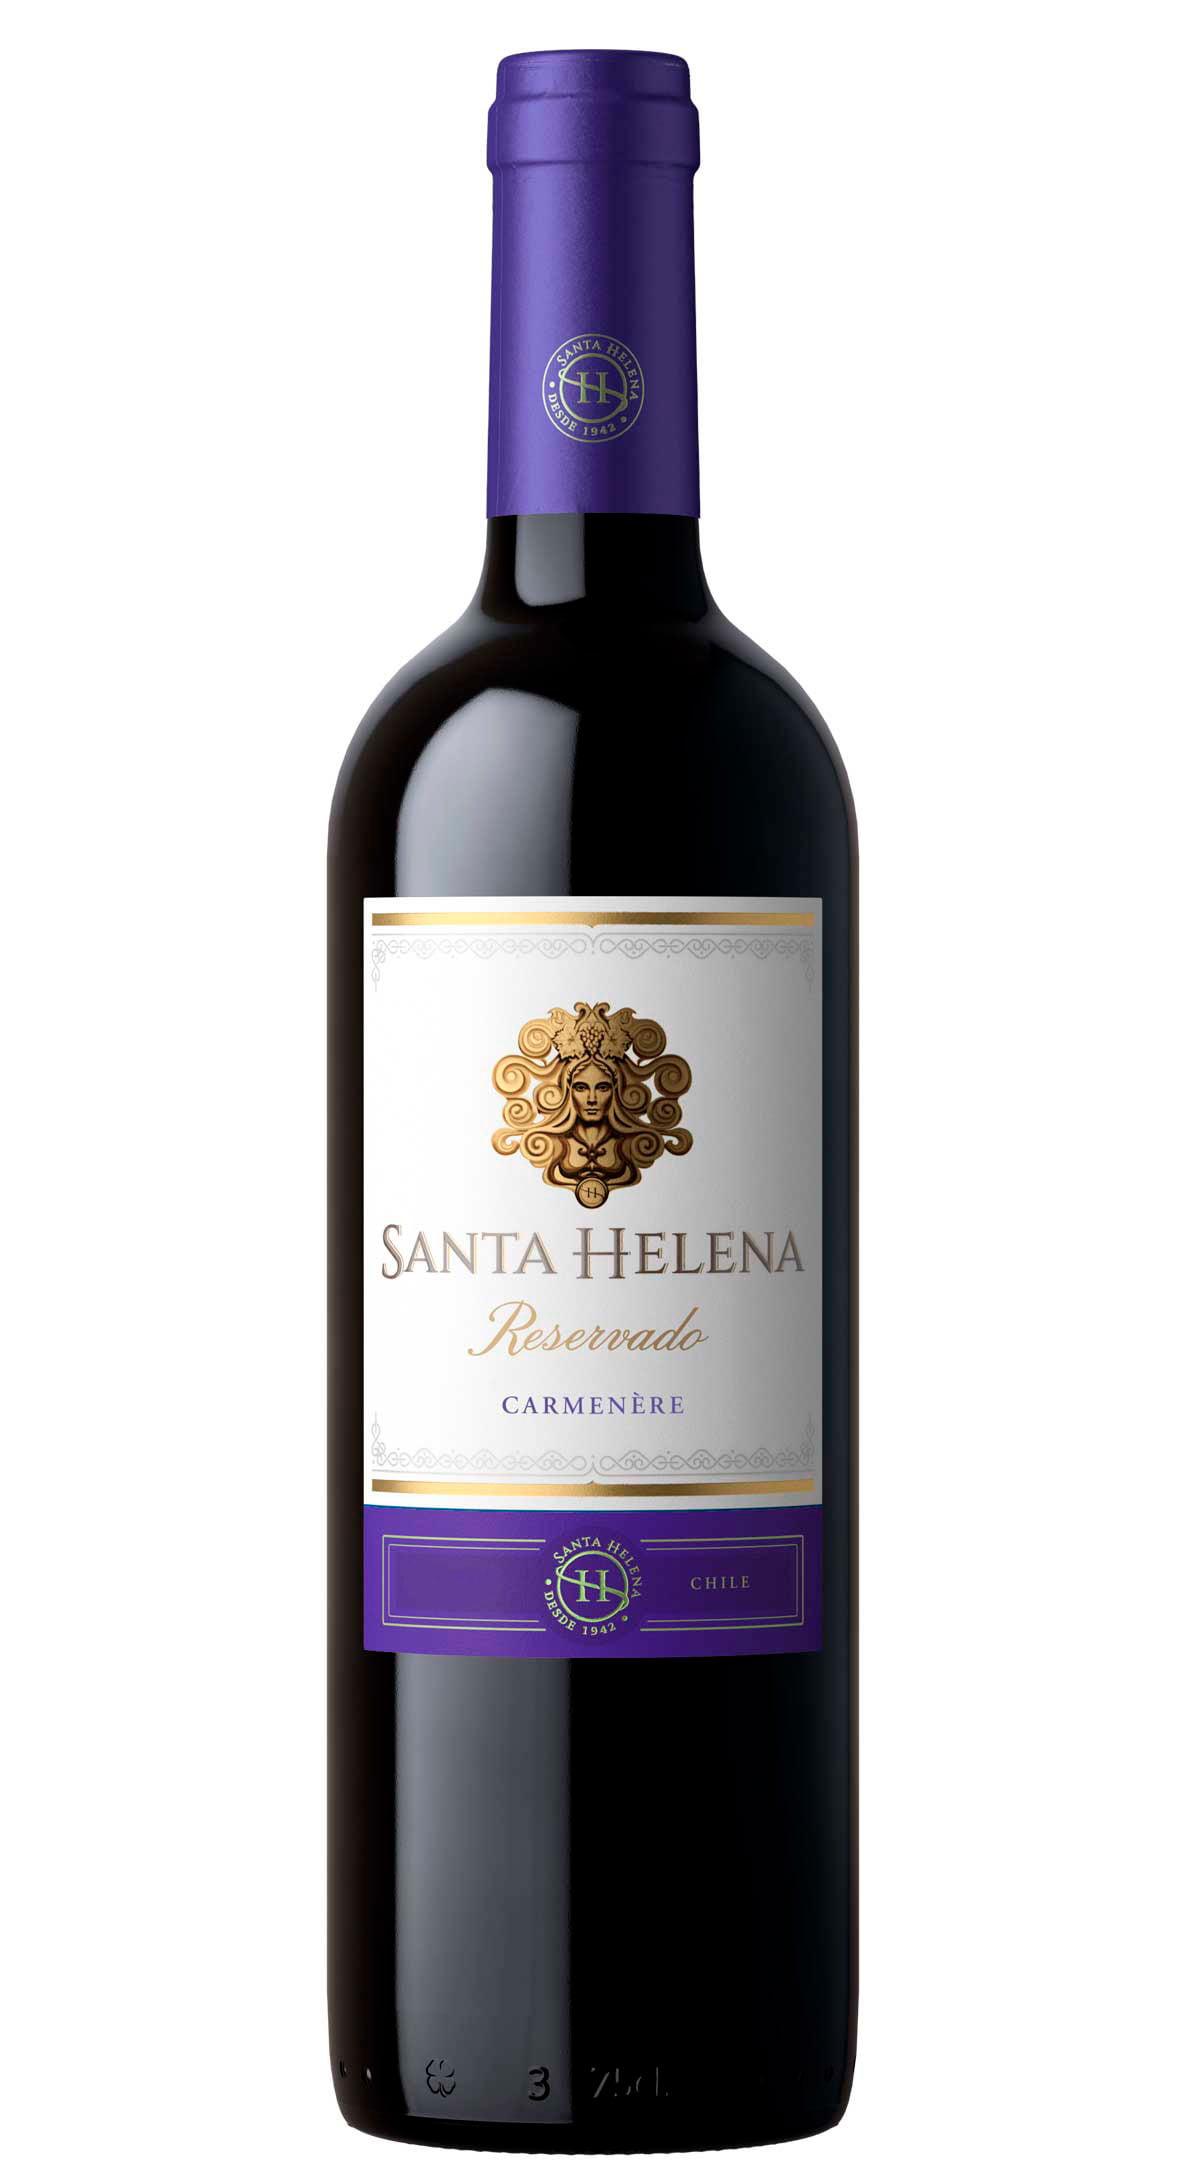 Vinho Santa Helena Reservado Carmenere 750ml